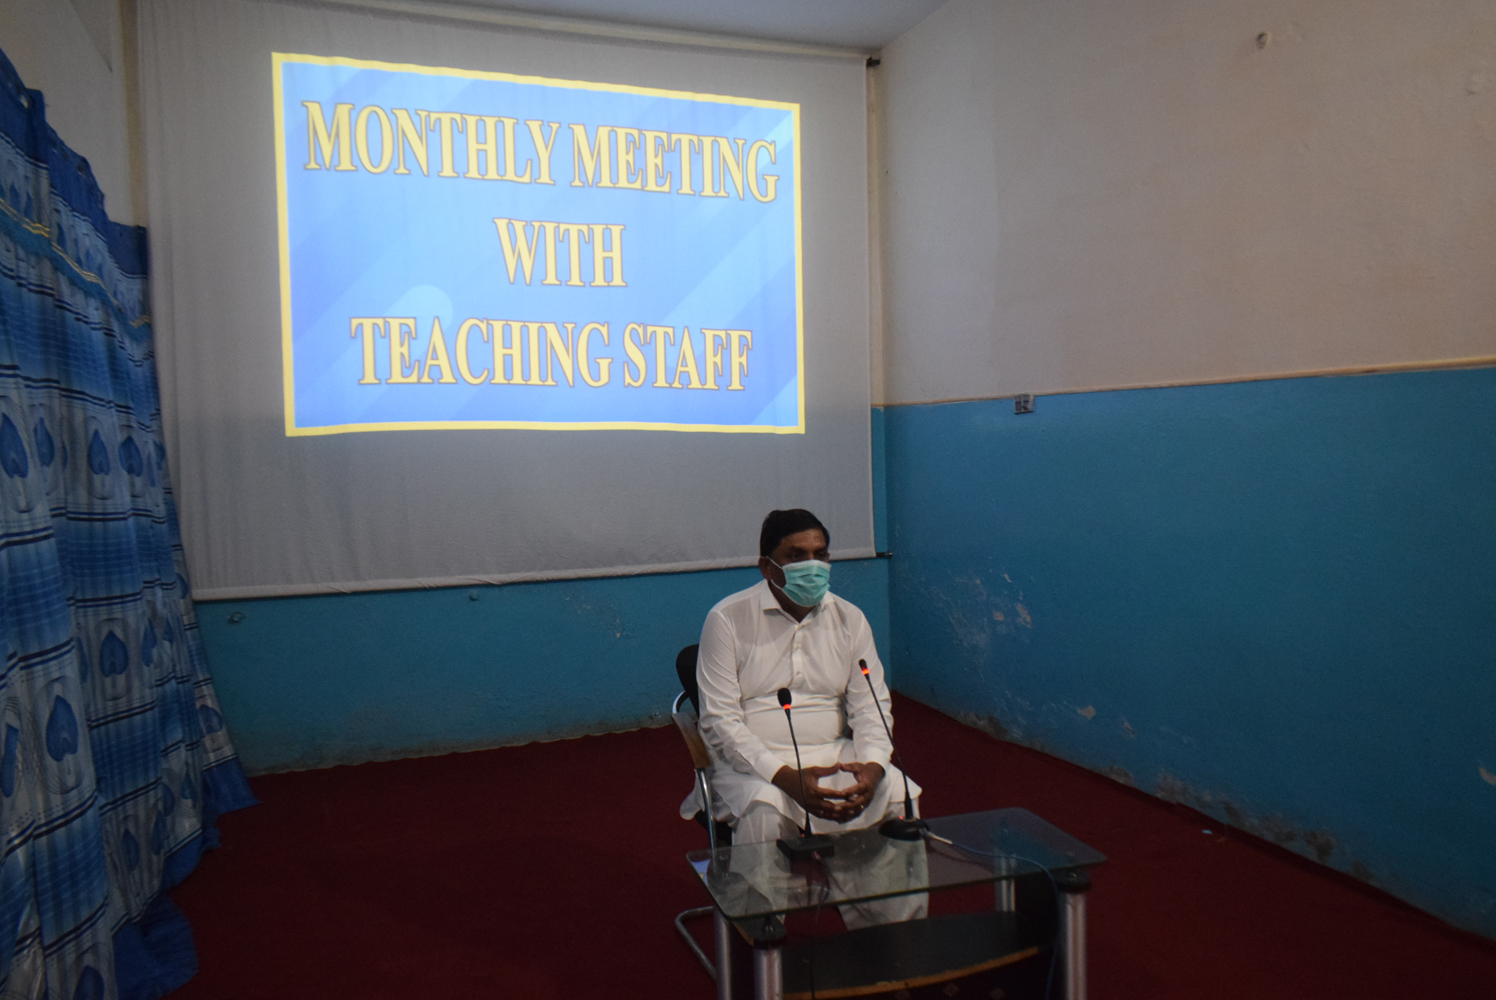 Teachers_Meeting-1